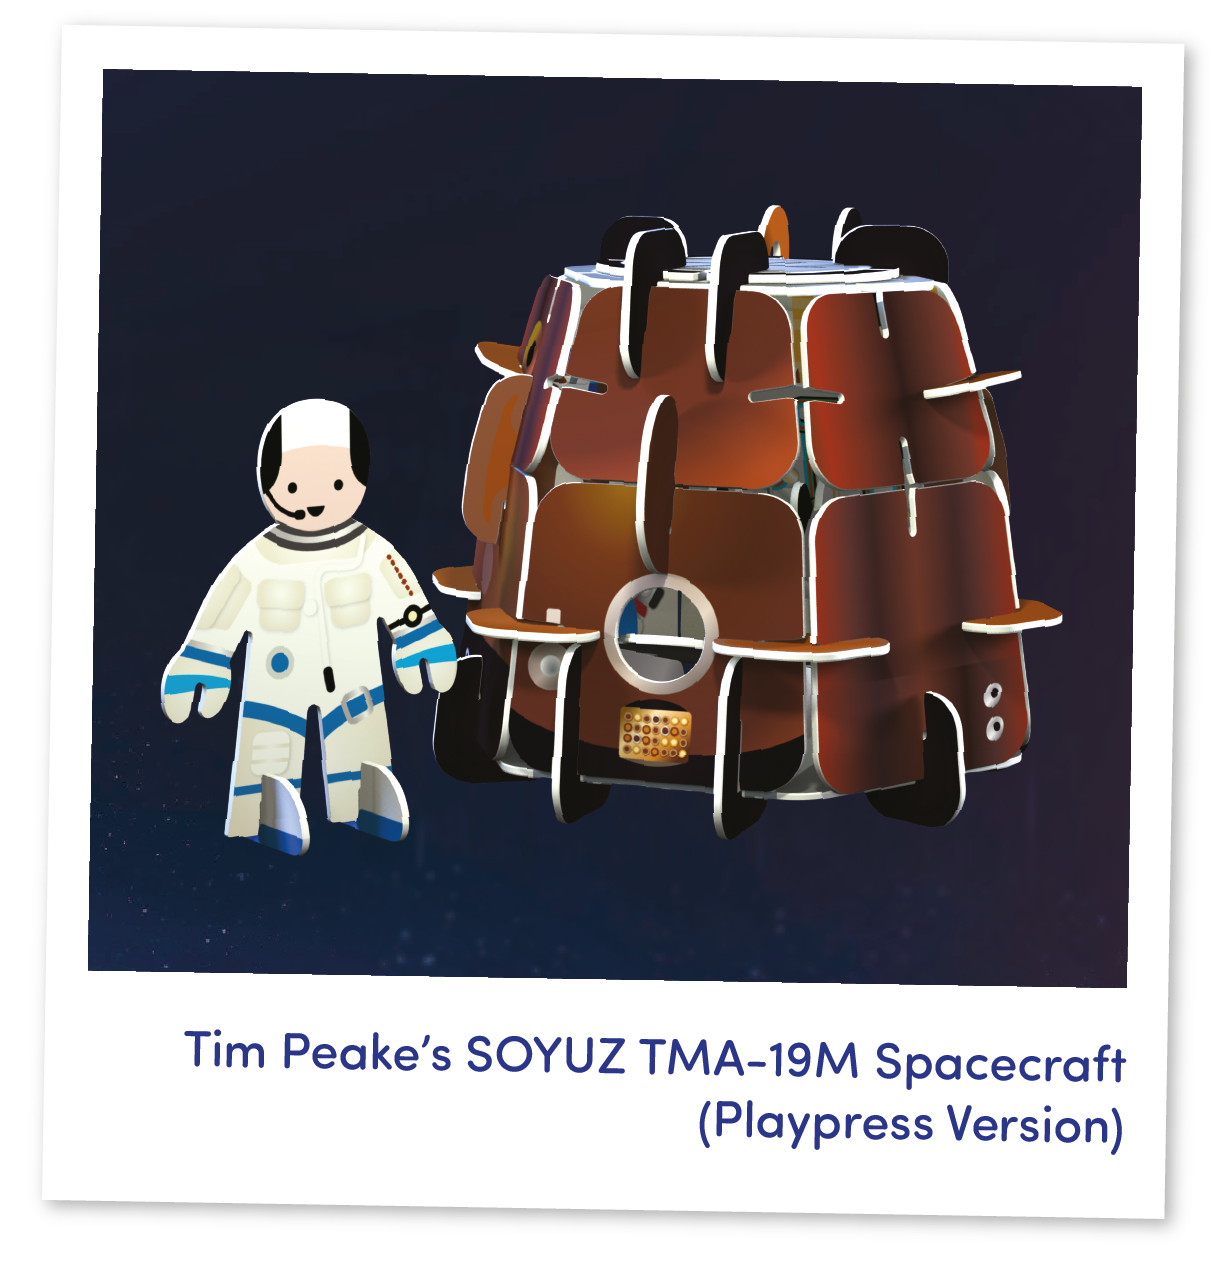 Images_Playpress Soyuz capsule photo.png